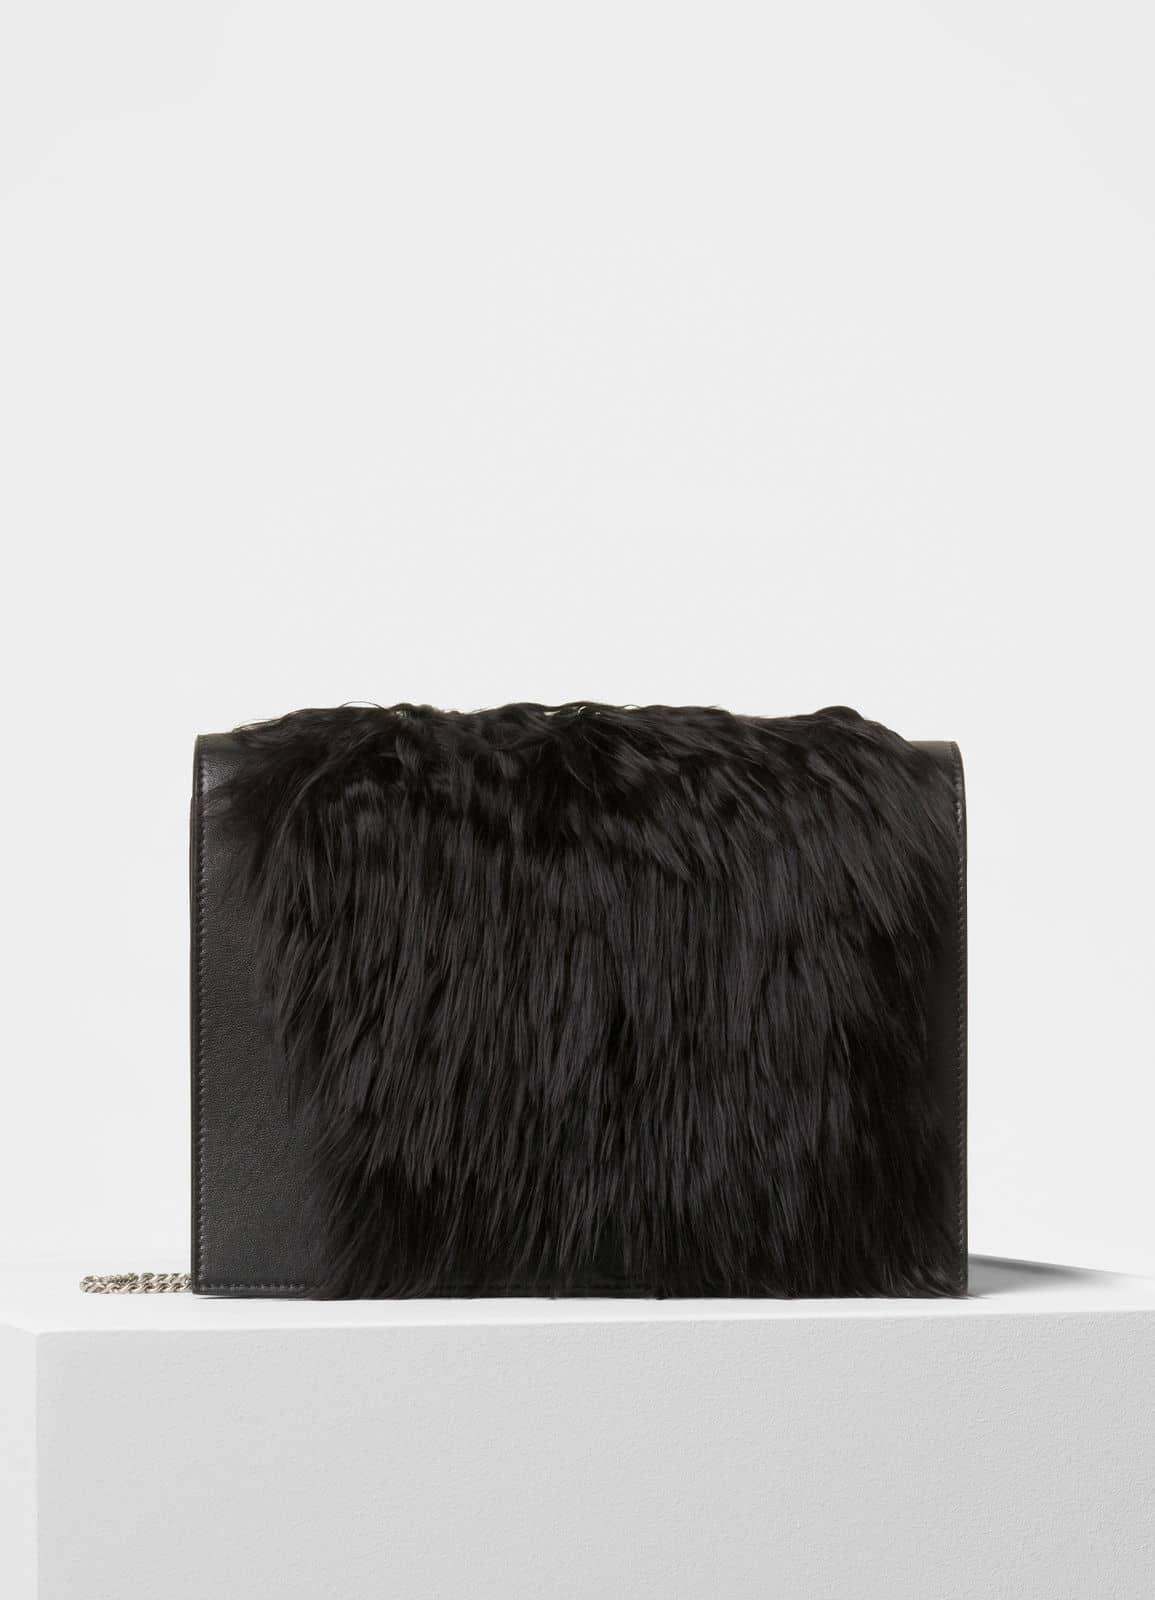 0cf874d41d4b Celine Black Fur Smooth Lamsbkin Frame Evening Clutch on Chain Bag